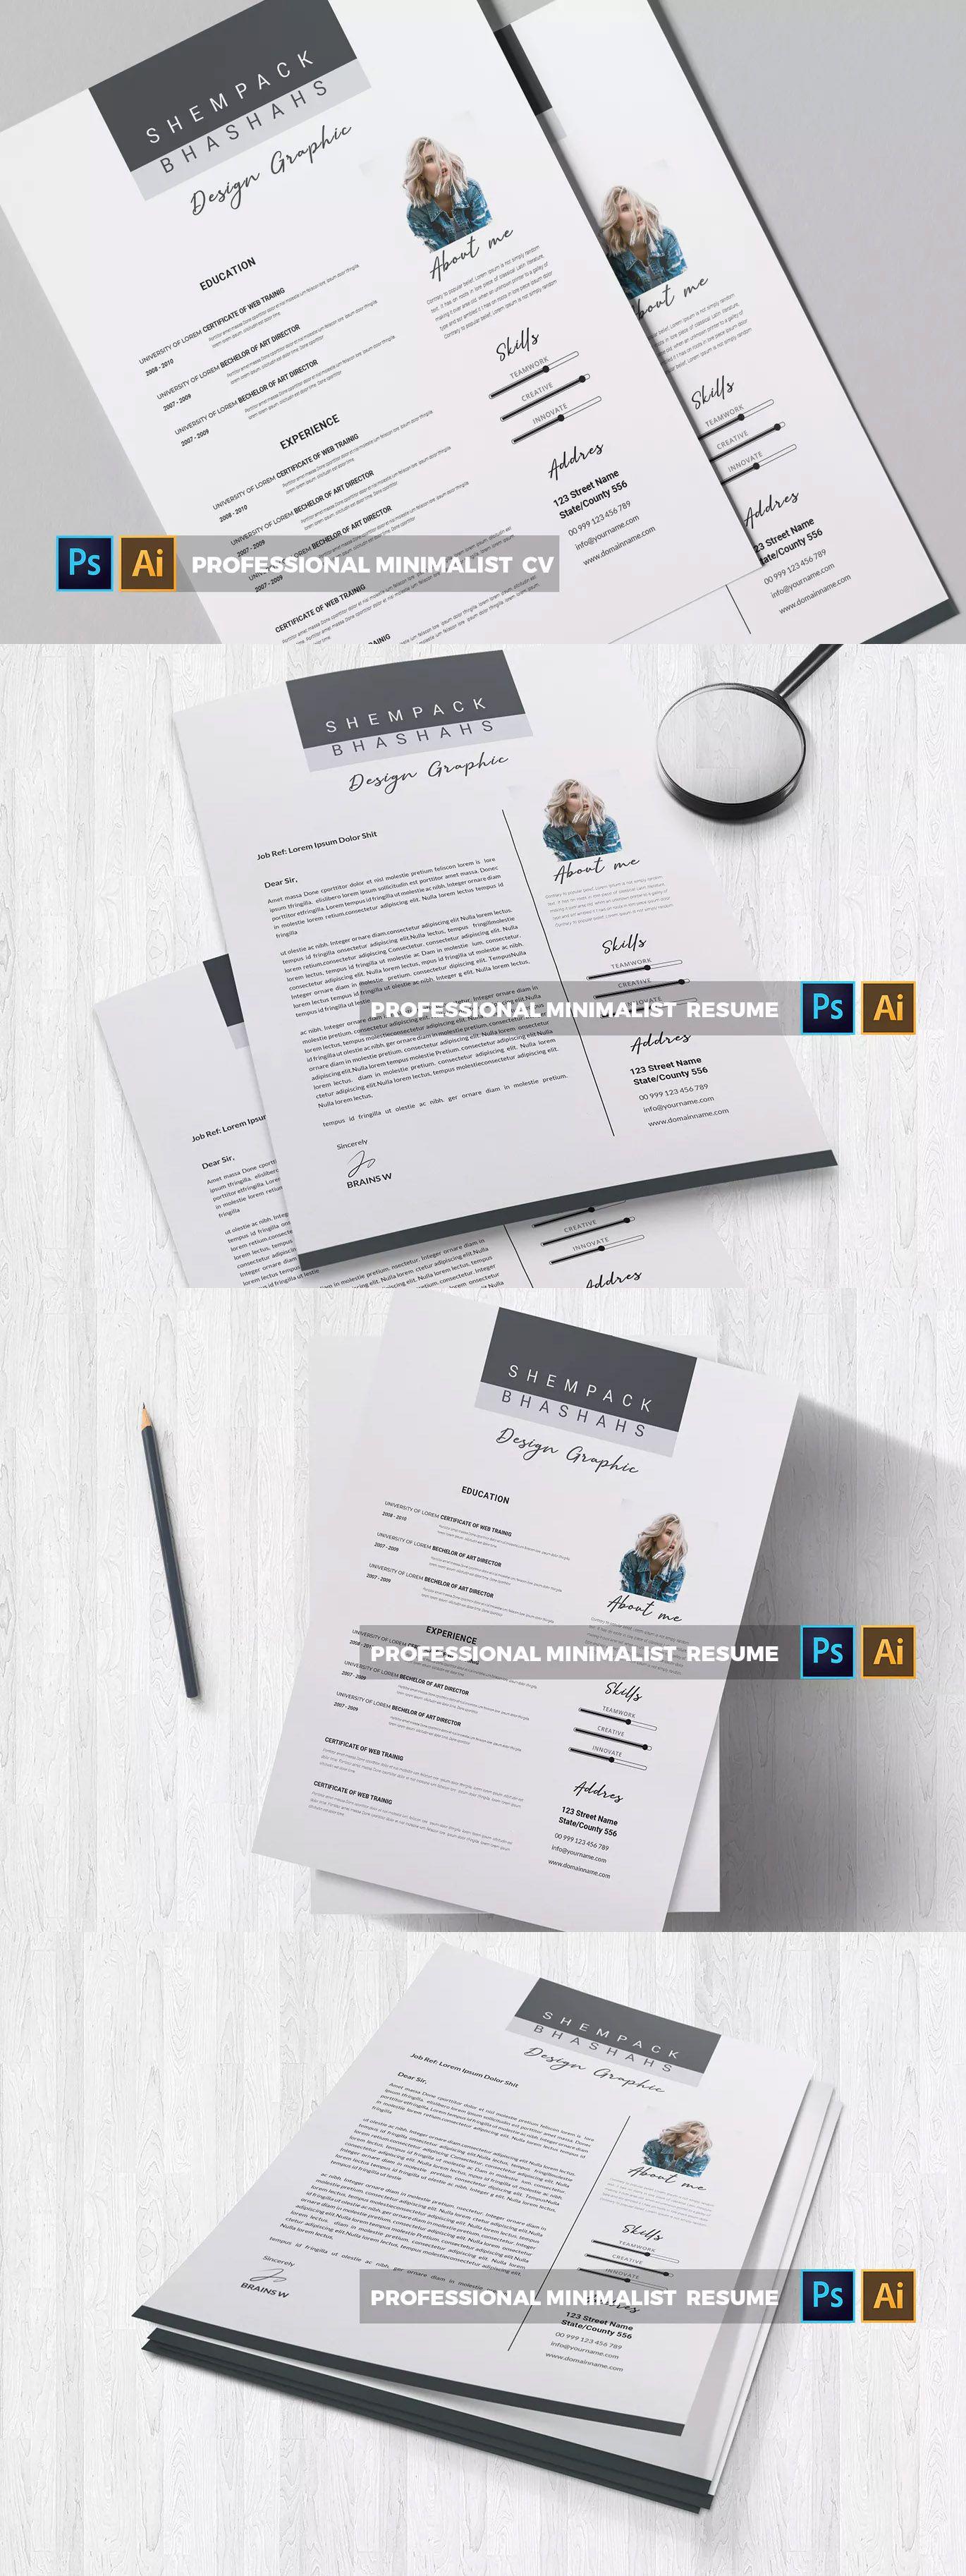 Professional Minimalist CV & Resume Template AI, EPS